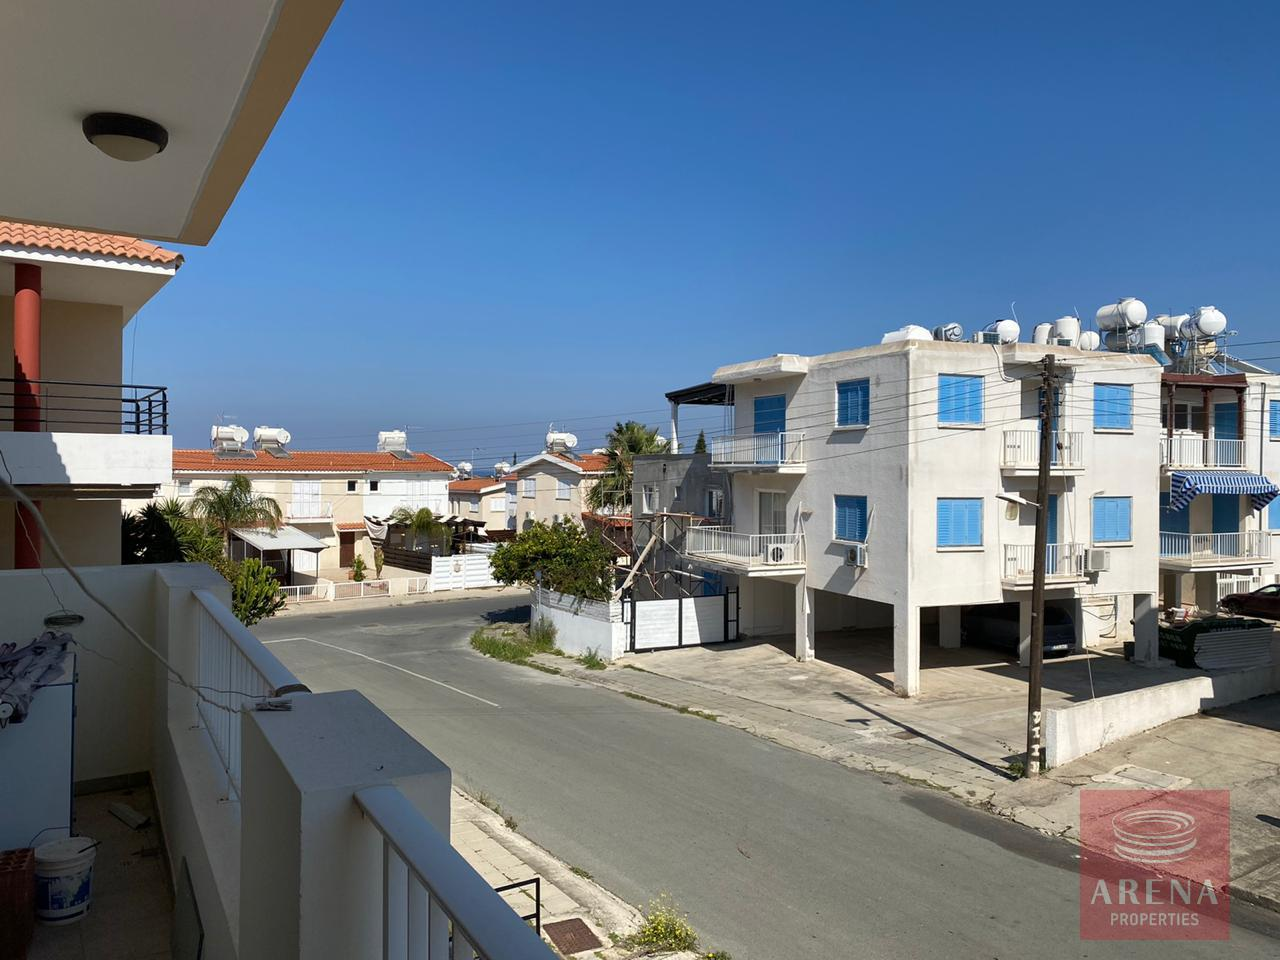 2 bedroom apartment in kapparis - views